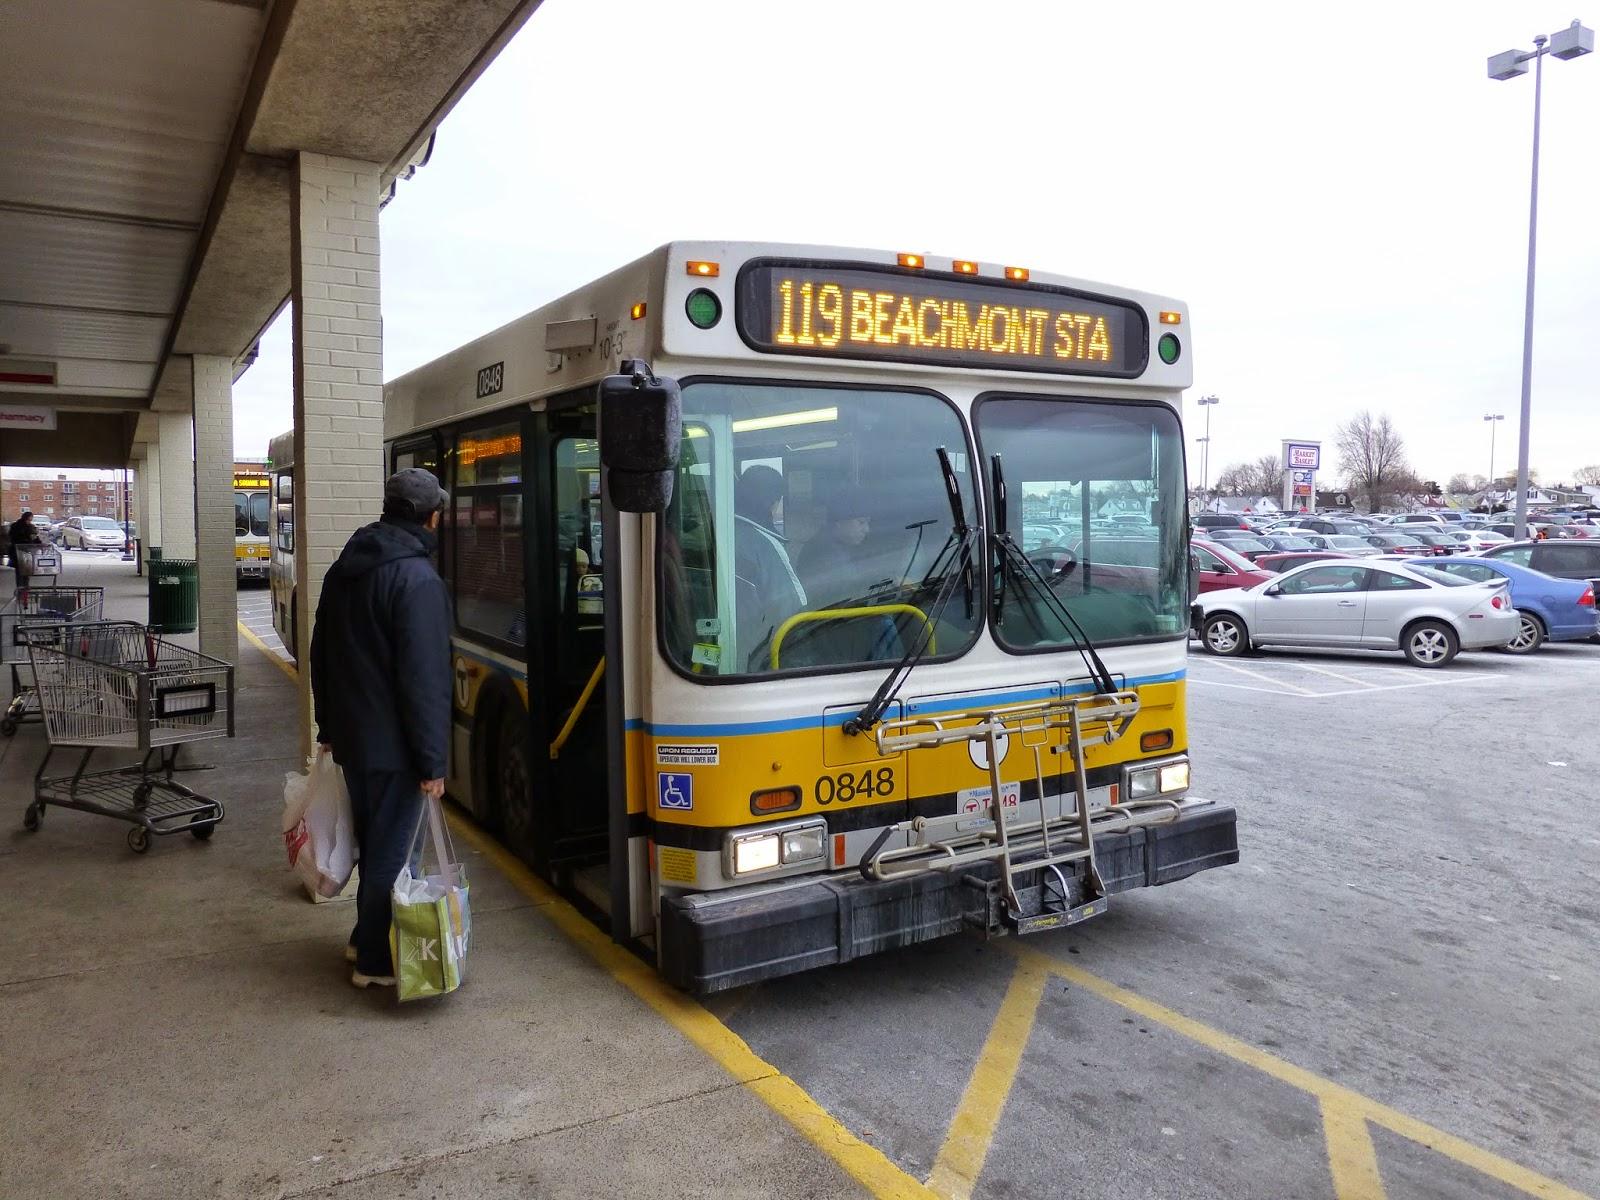 miles on the mbta: 119 (northgate - beachmont station via revere